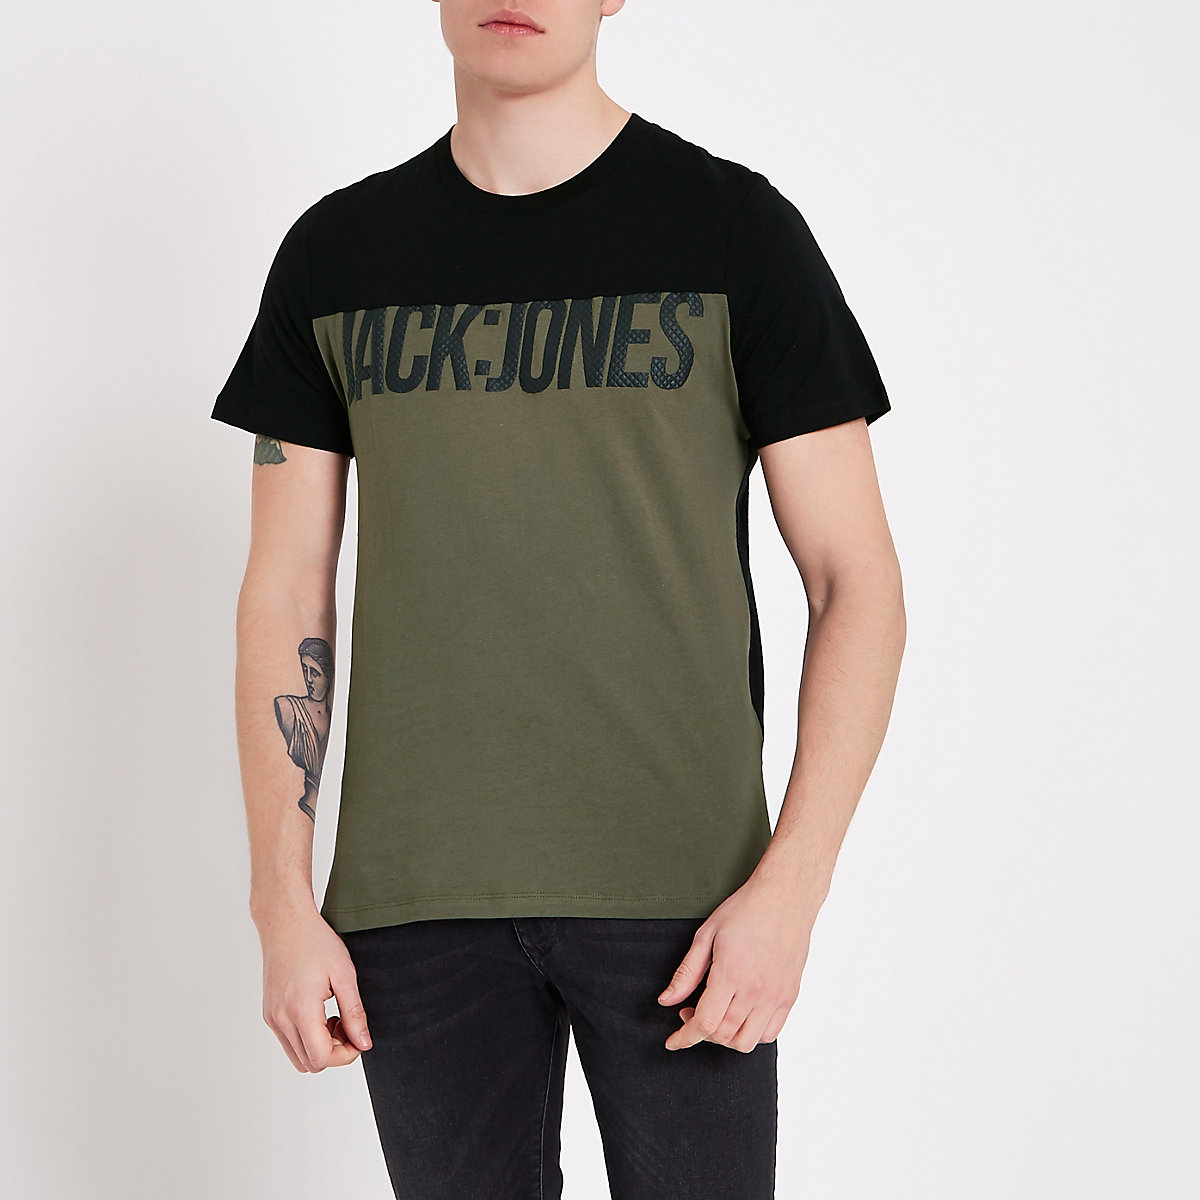 Jack & Jones core black crew neck T-shirt